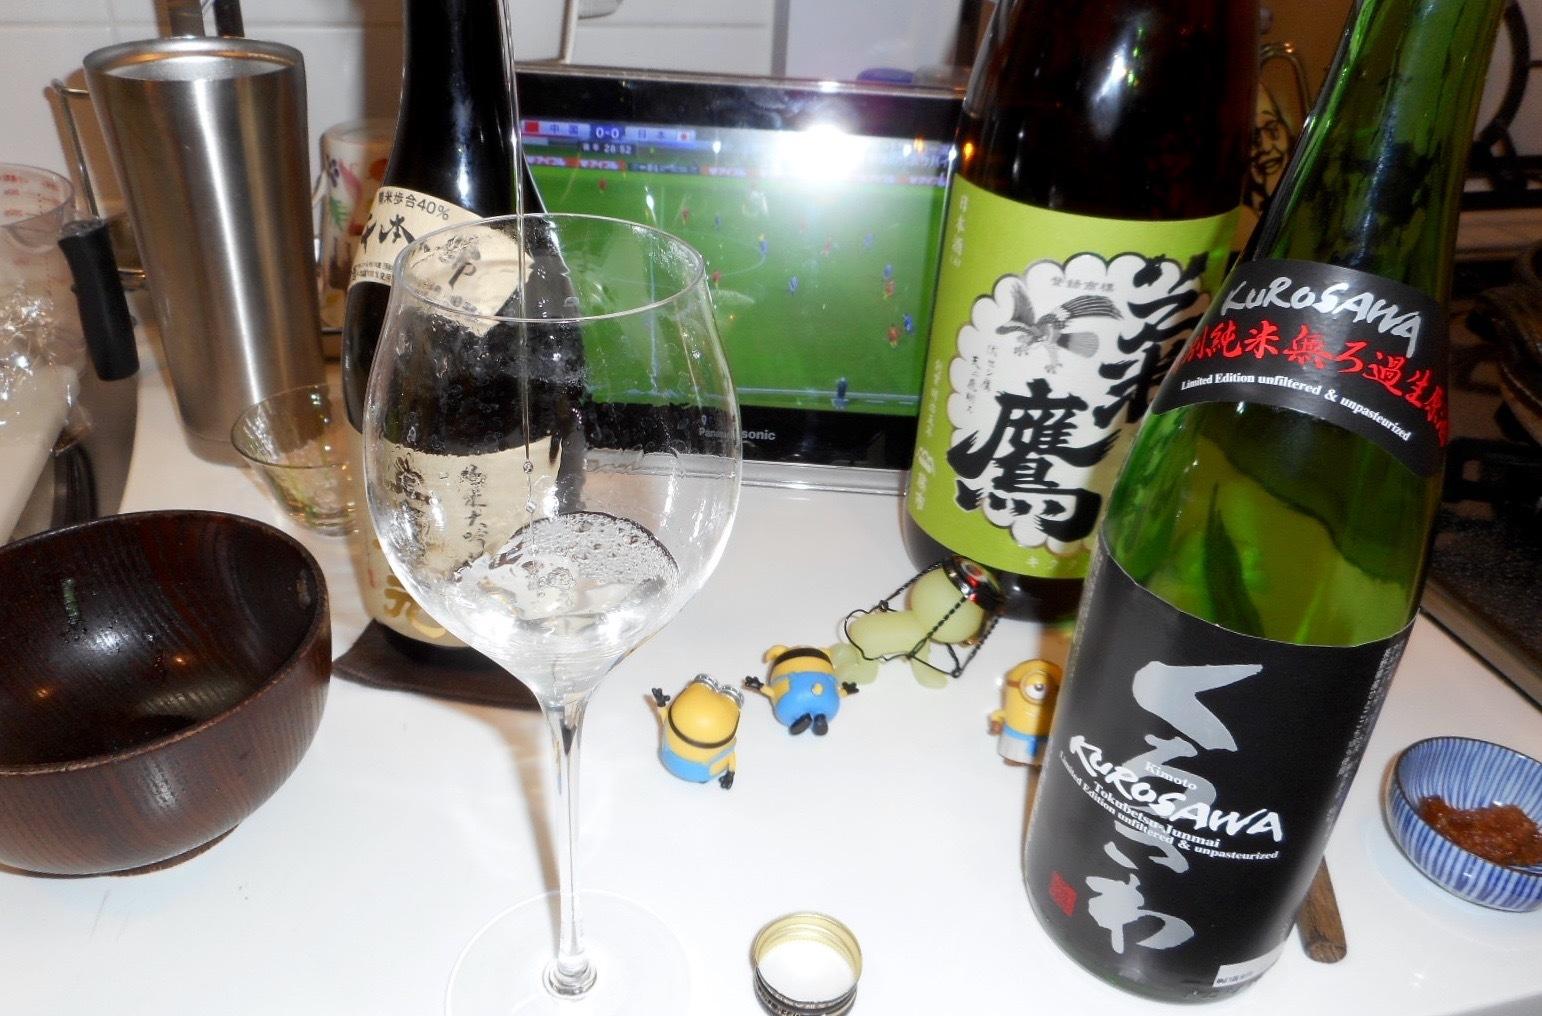 kurosawa_tokujun26by4.jpg